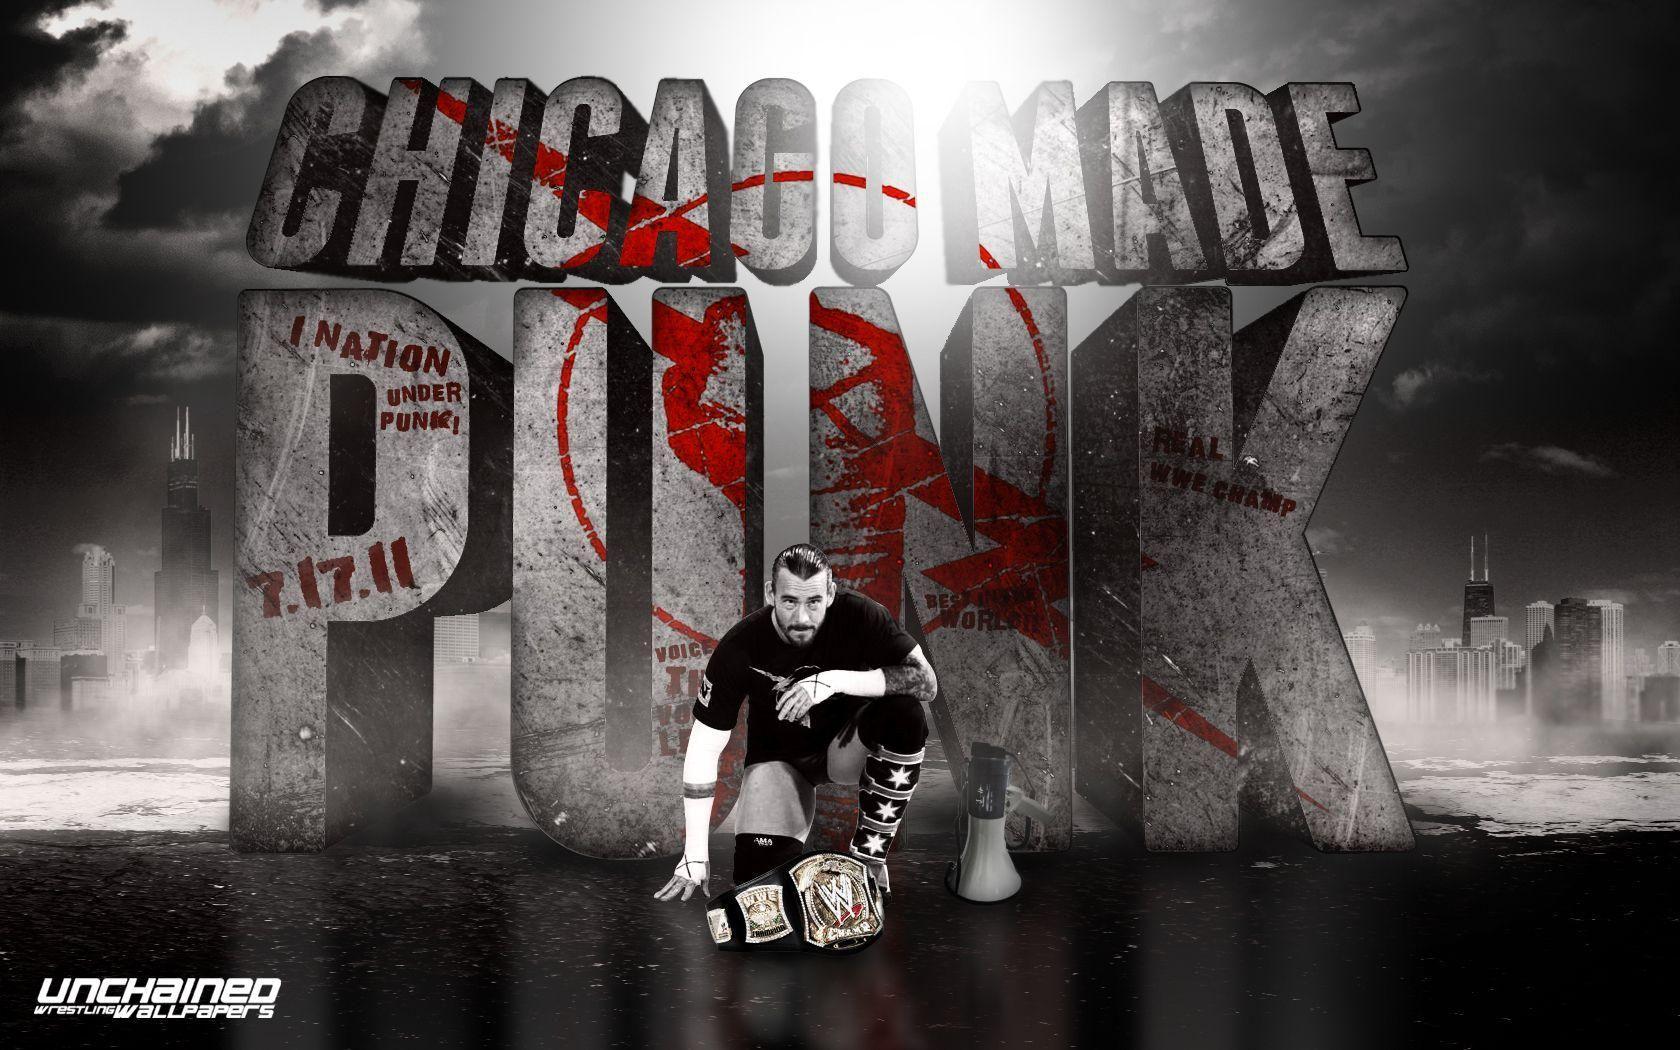 Cm Punk Cm Punk Photo Cm Punk Cmpunk Cmpunkwwe Wwe Cmpunkfans Wwe Photo Wwe Wrestlers Cm Punk Wallpapers Hd Punk Wallpaper Cm Punk Wallpapers Cm Punk